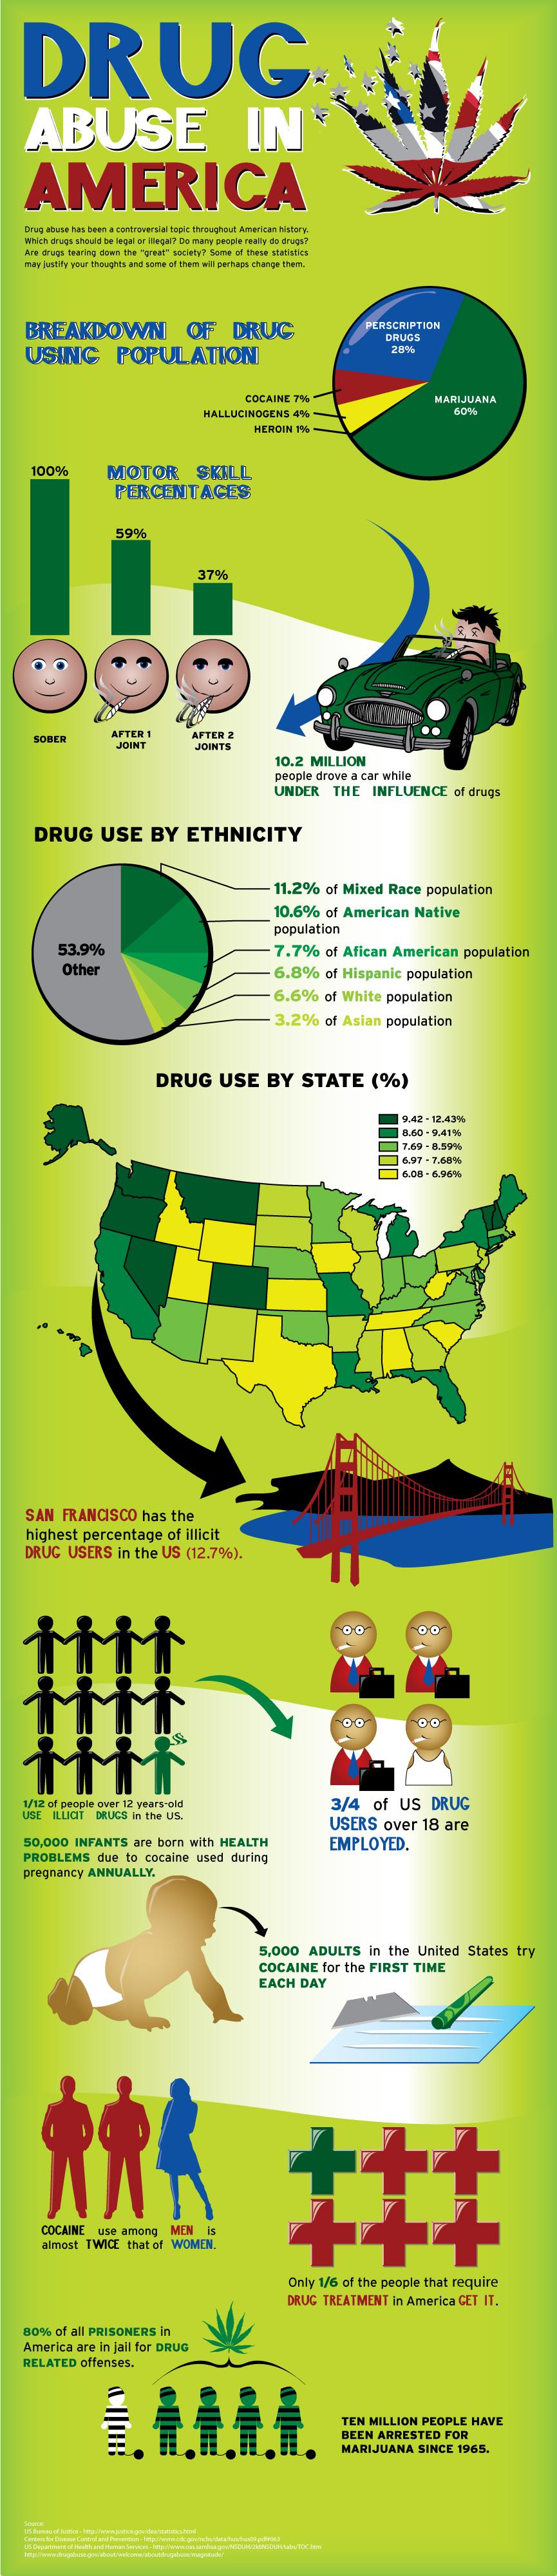 Drug abuse in America